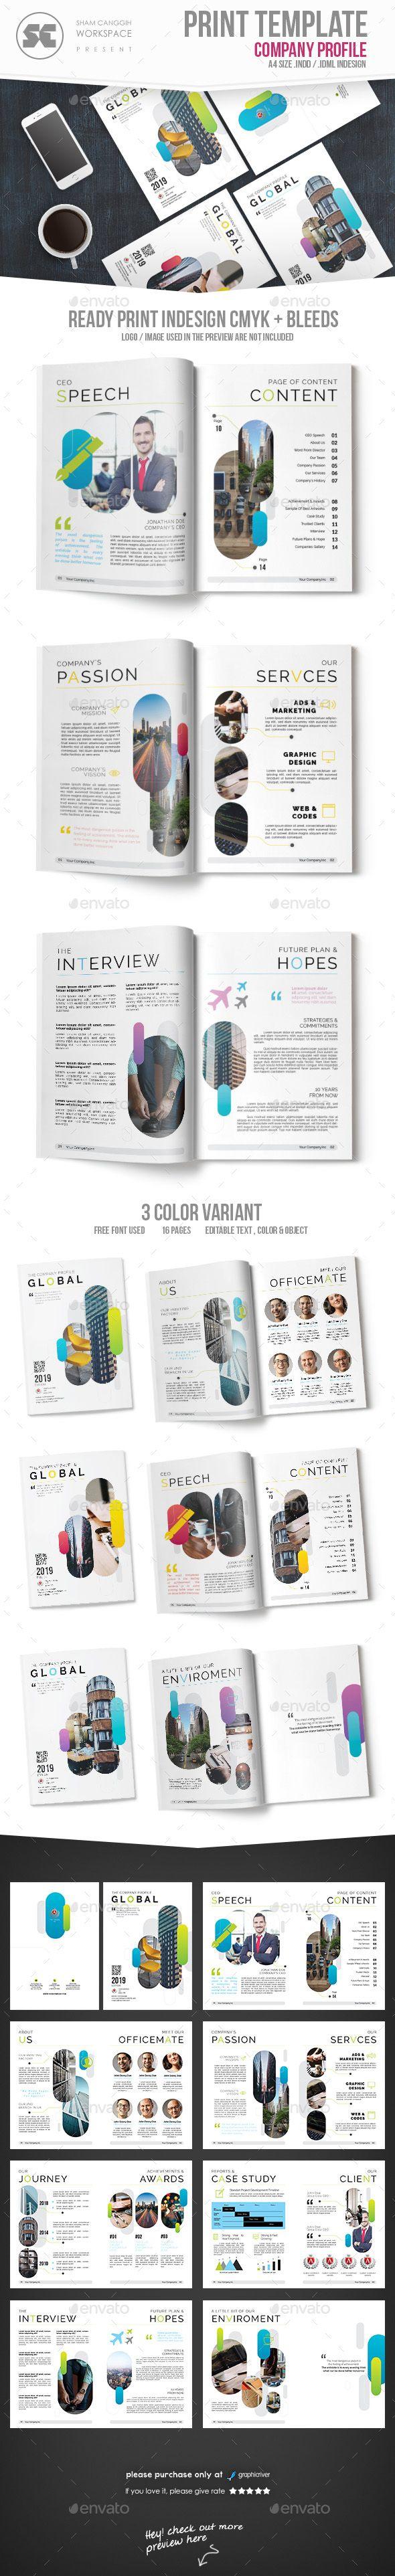 Company Profile | Company profile, Template and Brochures